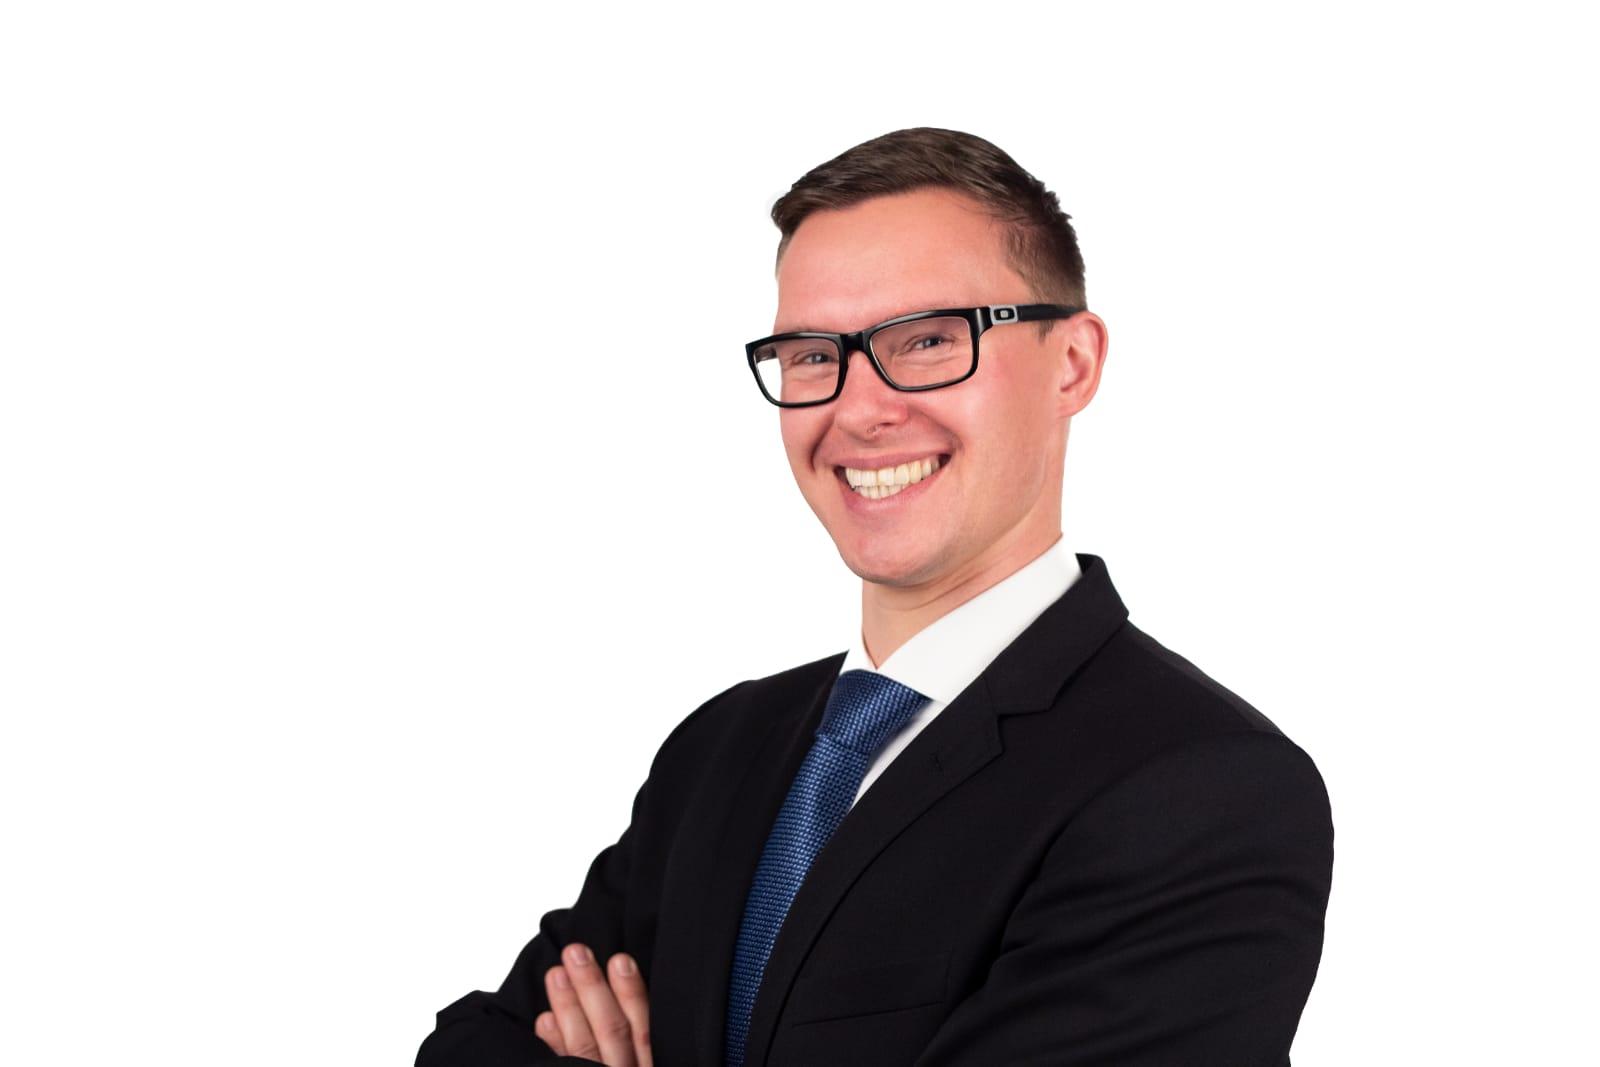 Matthias Egert